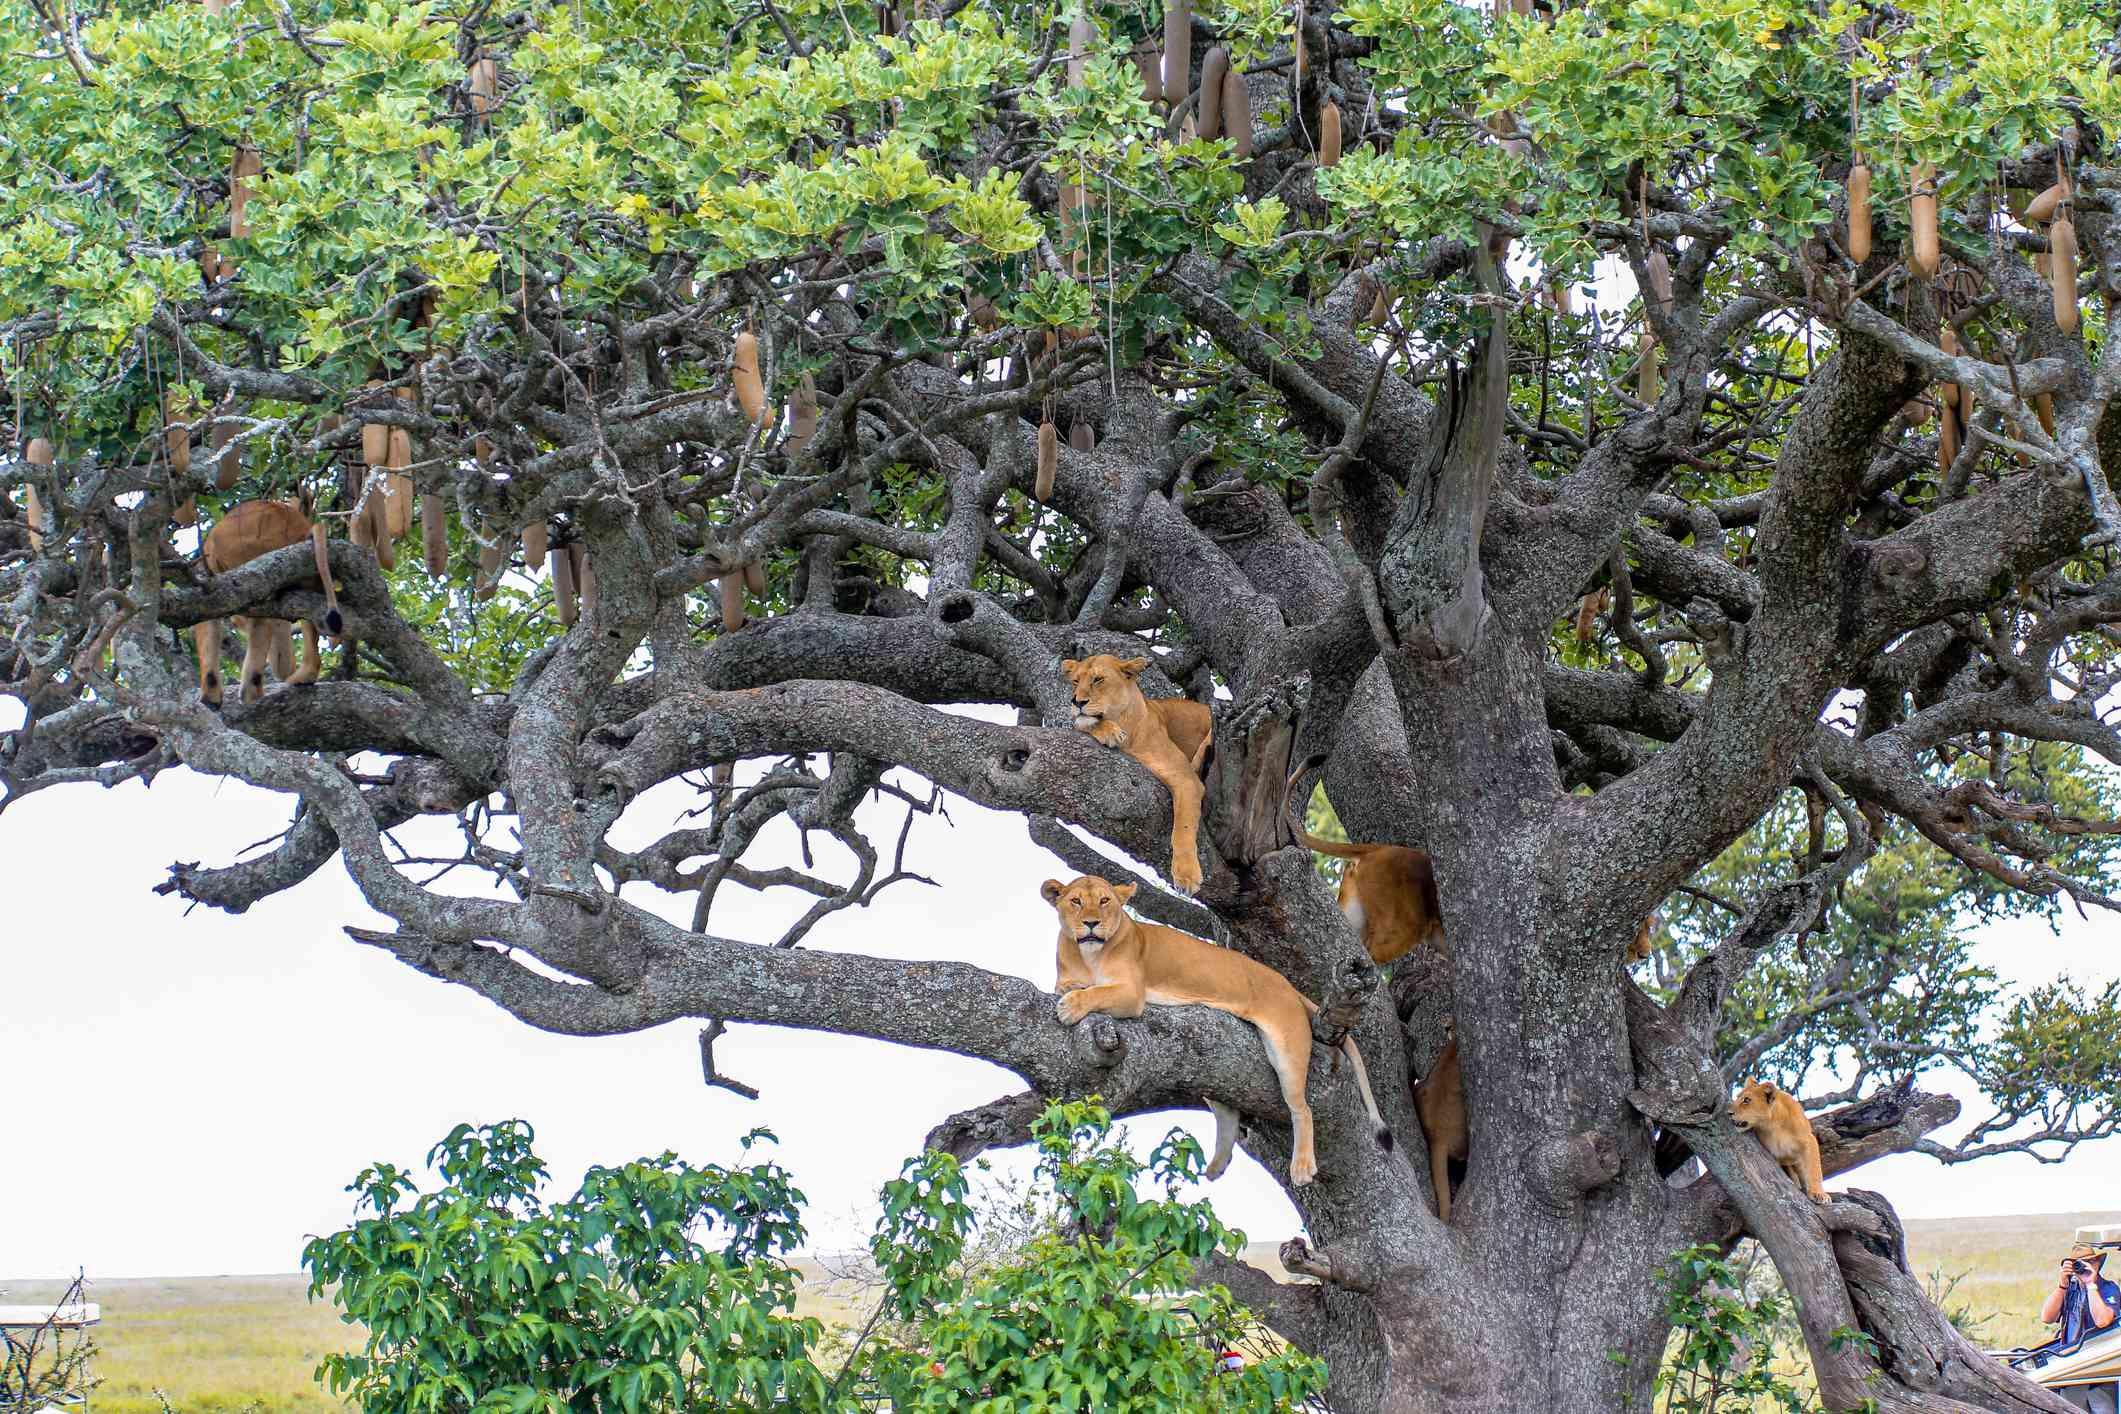 Tree-climbing lions in Lake Manyara National Park, Tanzania